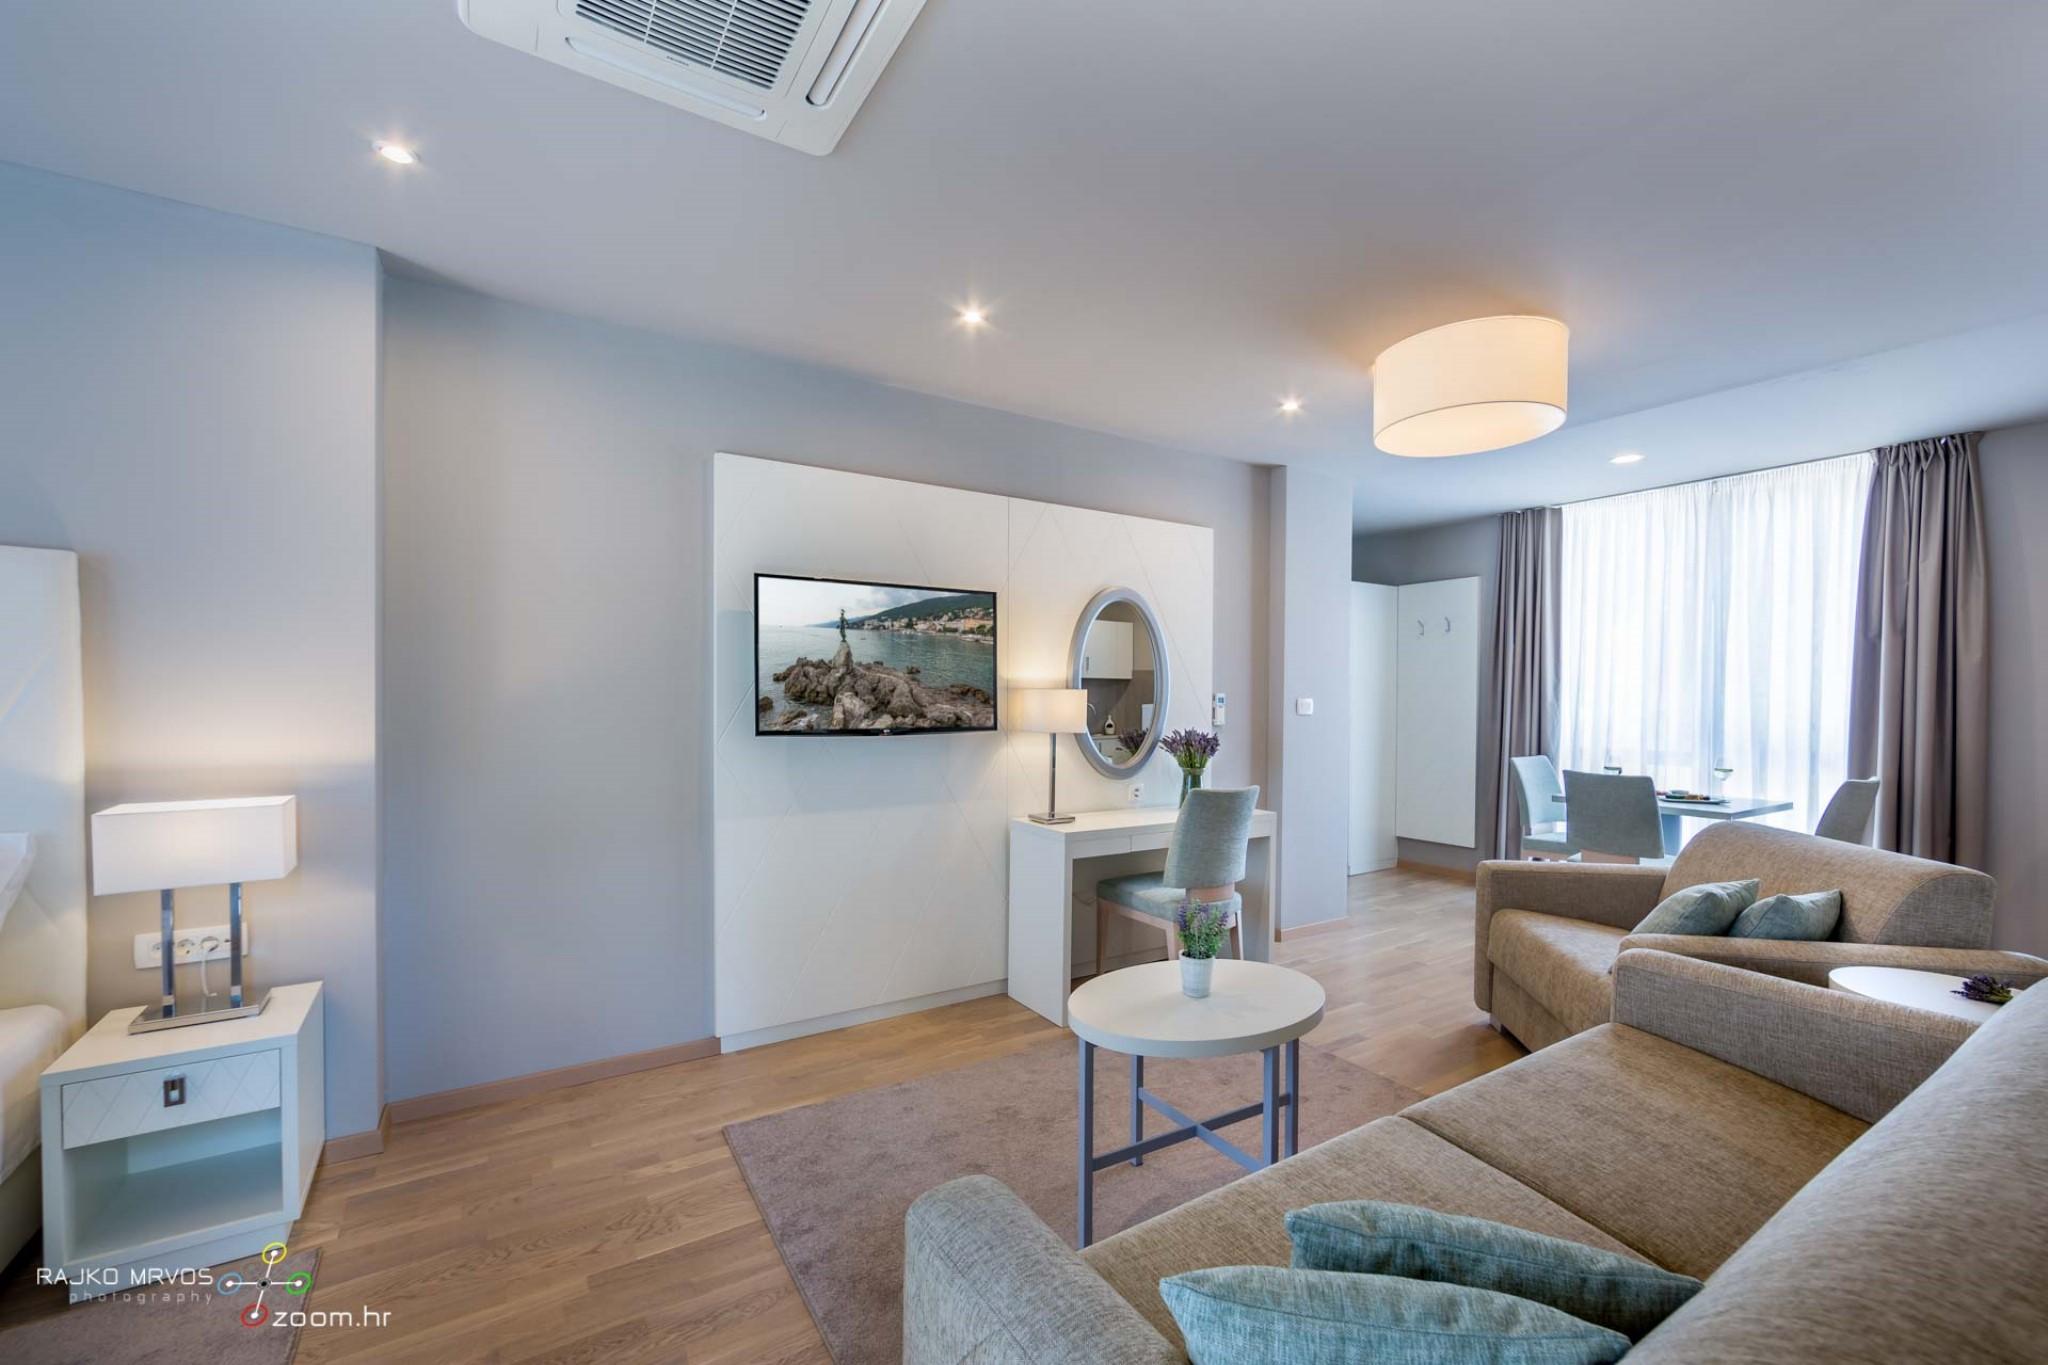 fotografiranje-interijera-fotograf-eksterijera-apartmana-vila-kuca-apartman-Preelook-33